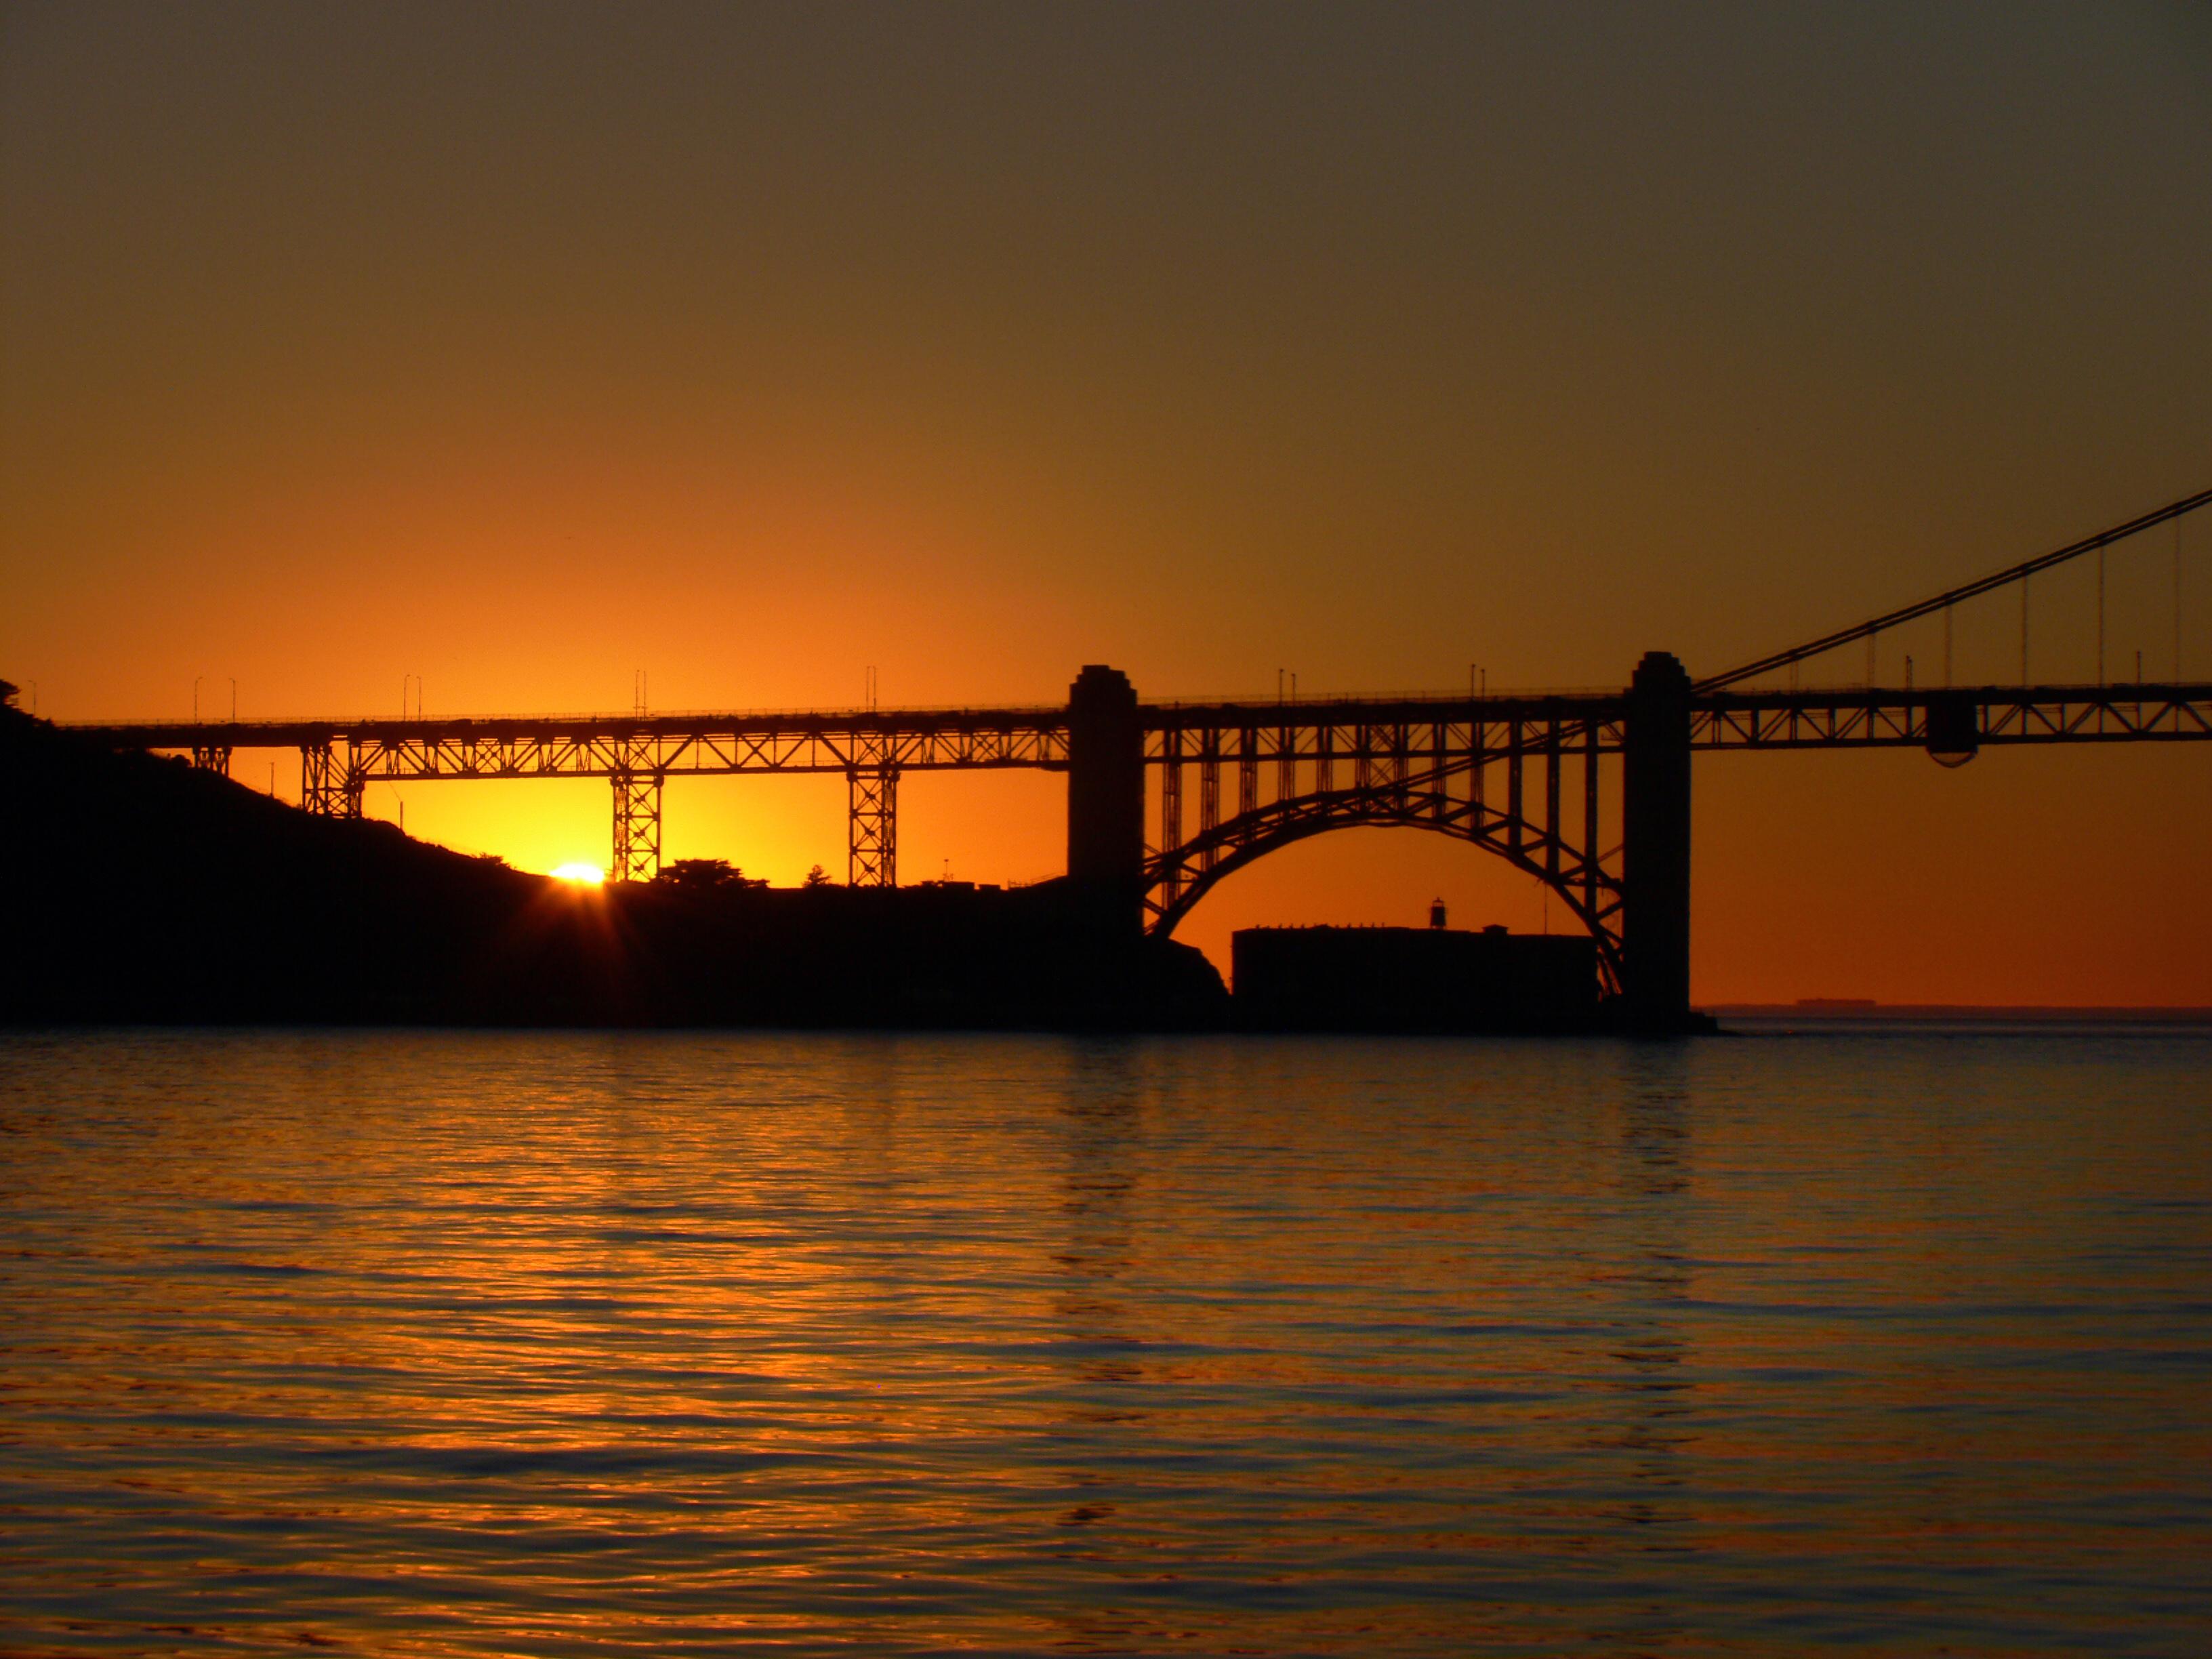 Golden Gate Sunset., Architecture, Bridge, Dusk, Free photos, HQ Photo